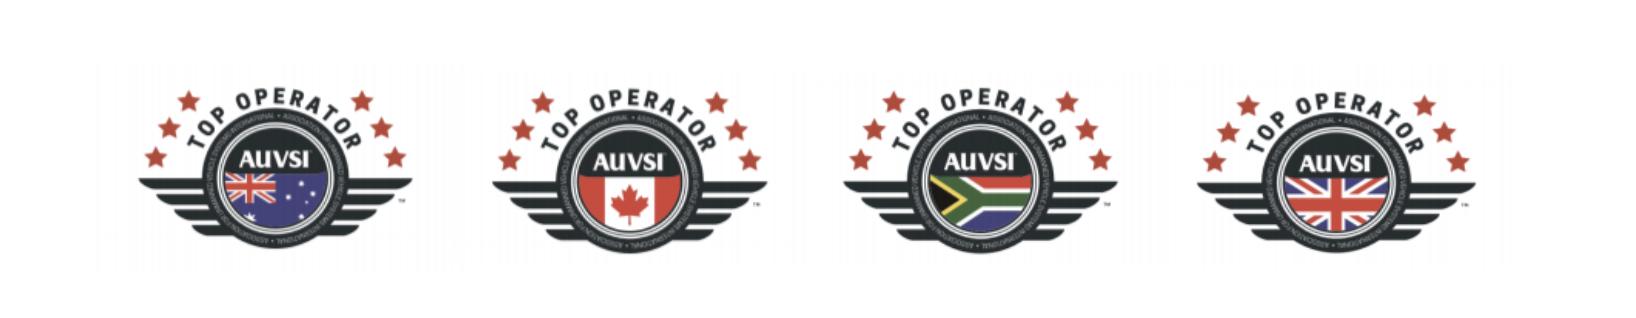 Trusted Operator Program Certification